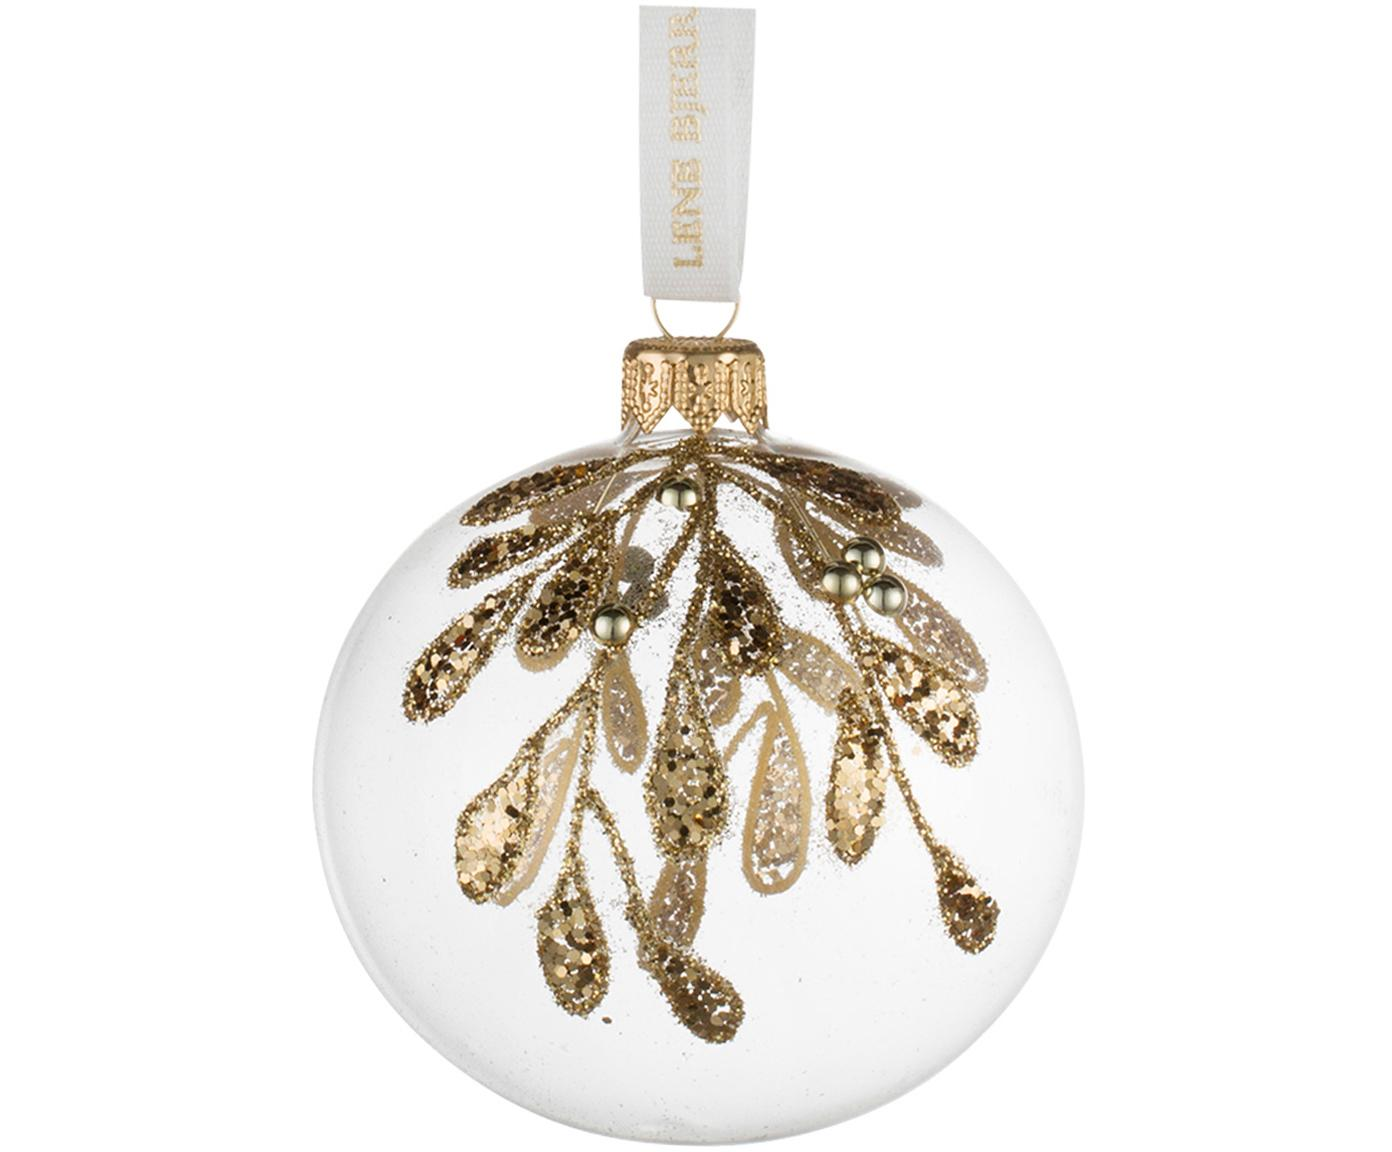 Palline di Natale Cadelia, 2 pz., Trasparente, dorato, Ø 8 cm